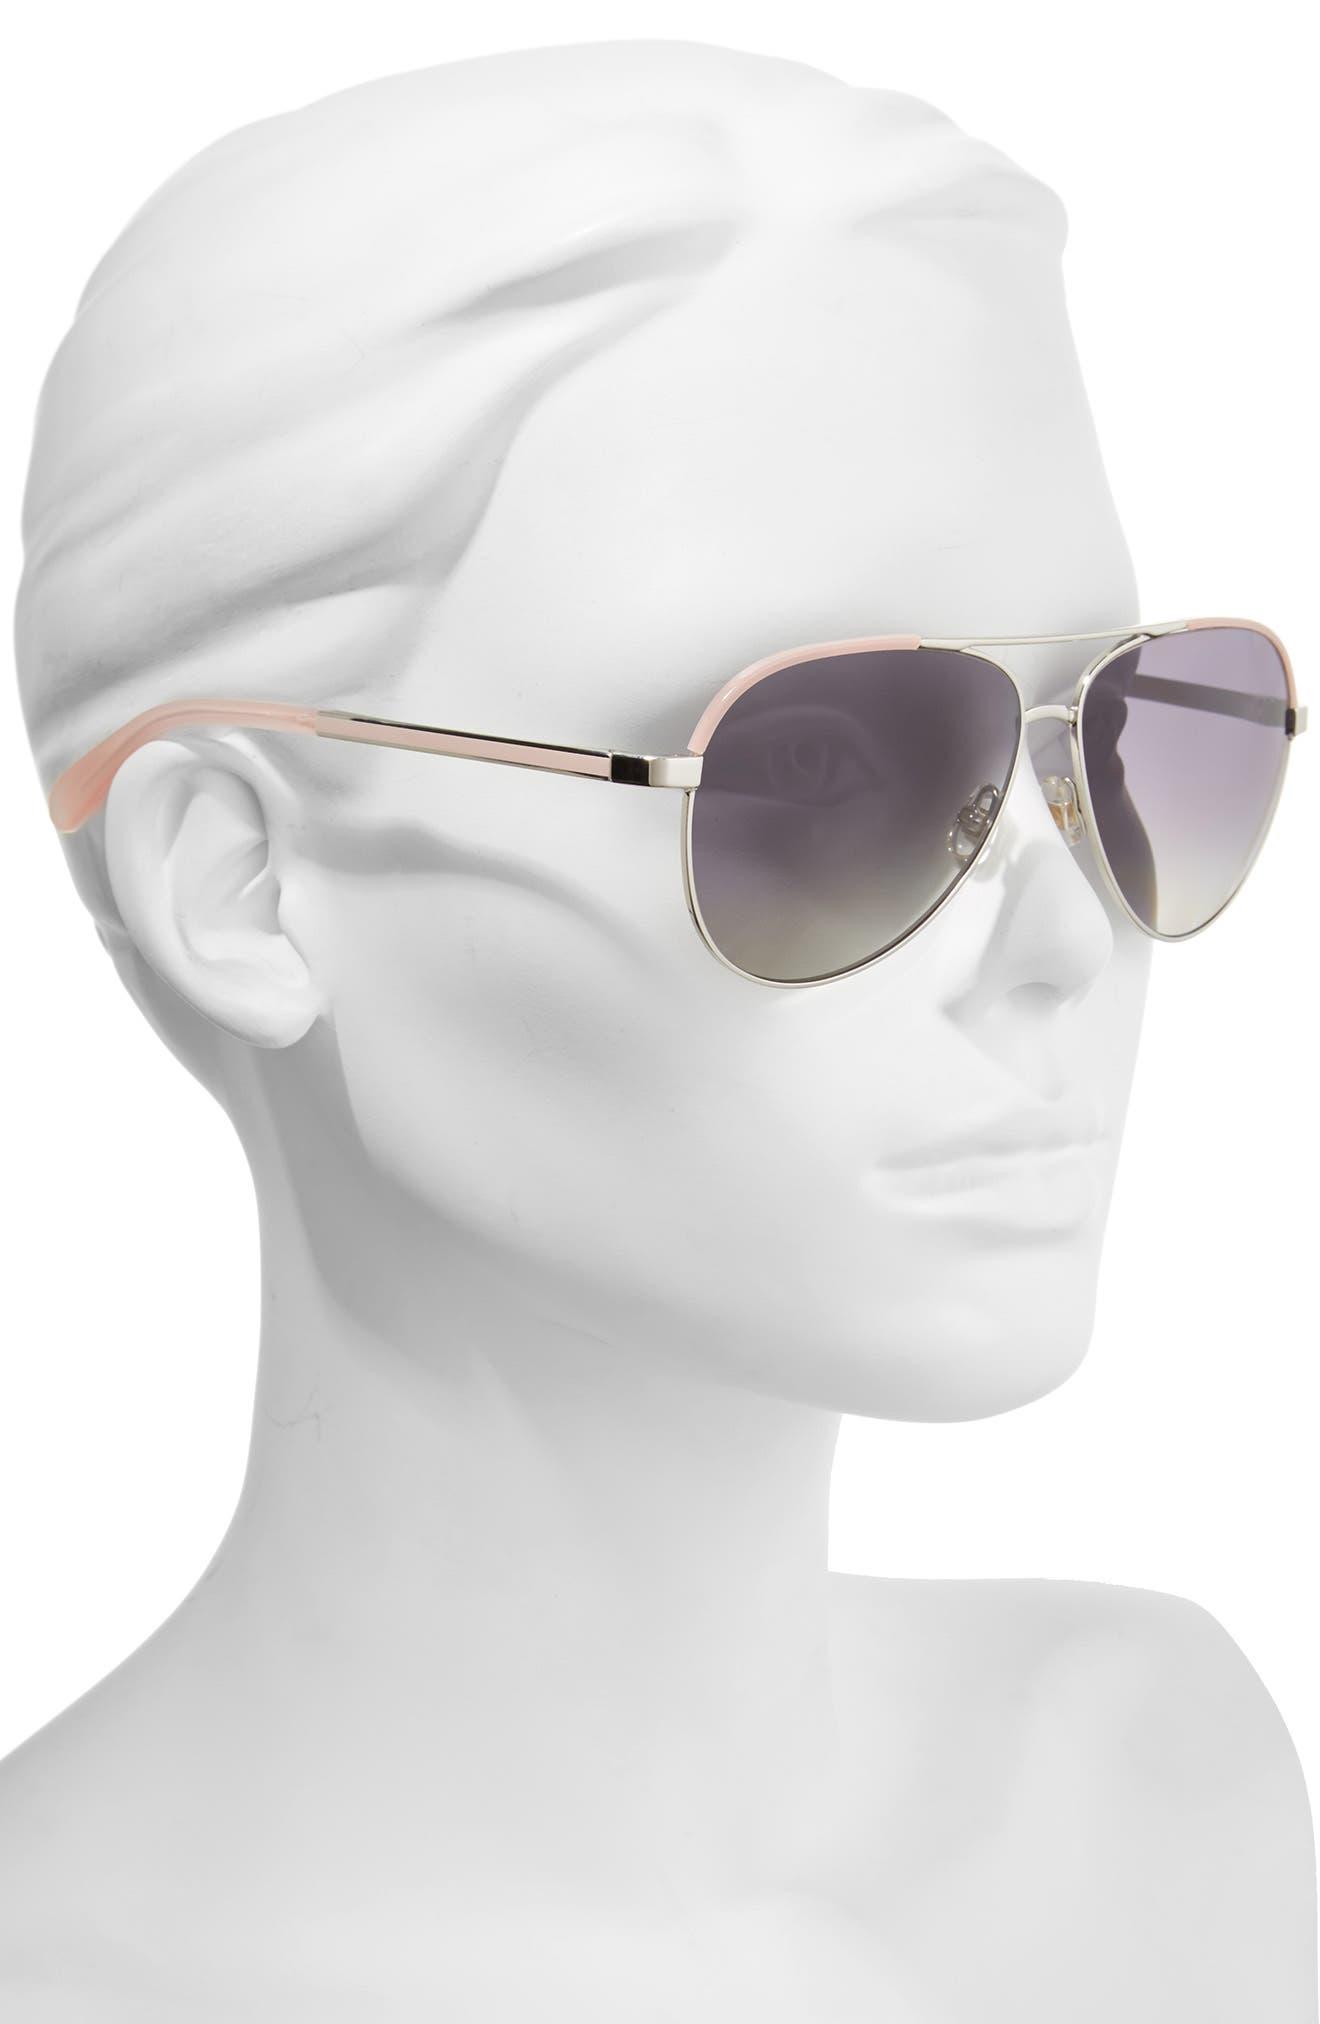 amarissa 59mm polarized aviator sunglasses,                             Alternate thumbnail 2, color,                             040